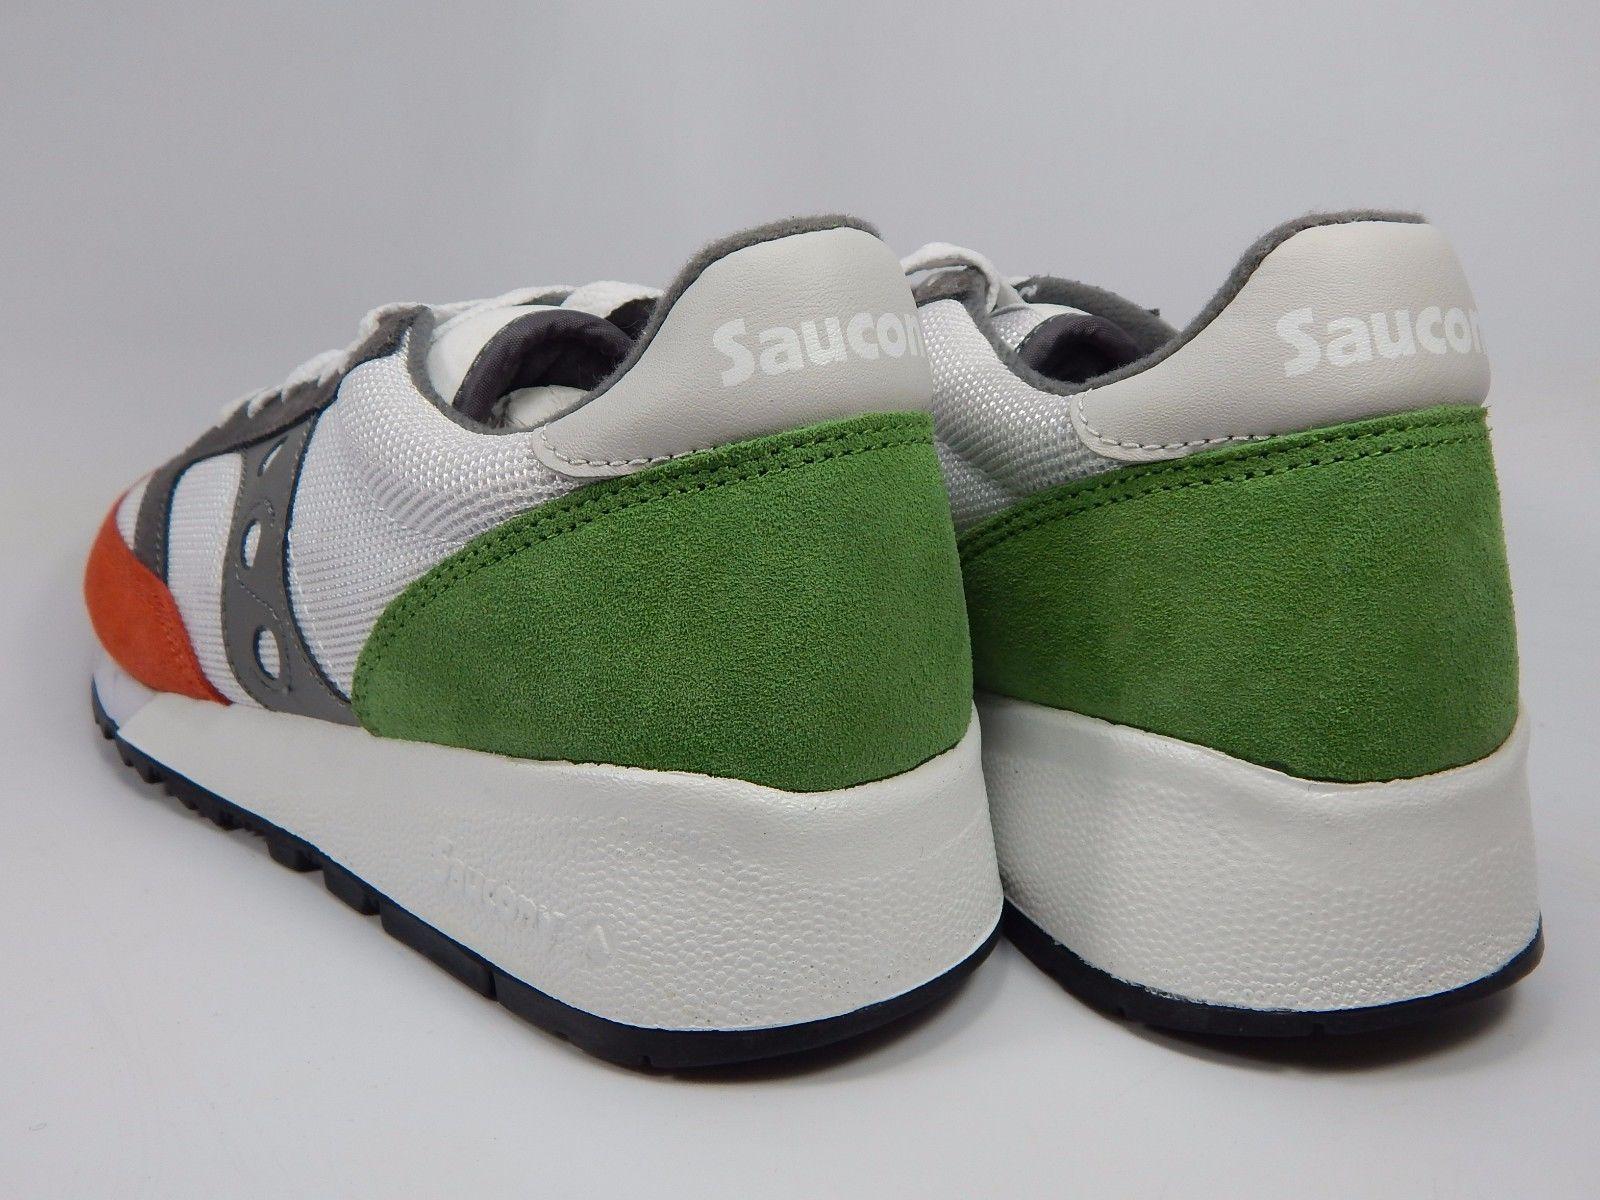 Saucony Original Jazz 91 Men's Running Shoes Size US 9 M (D) EU 42.5 S70216-3